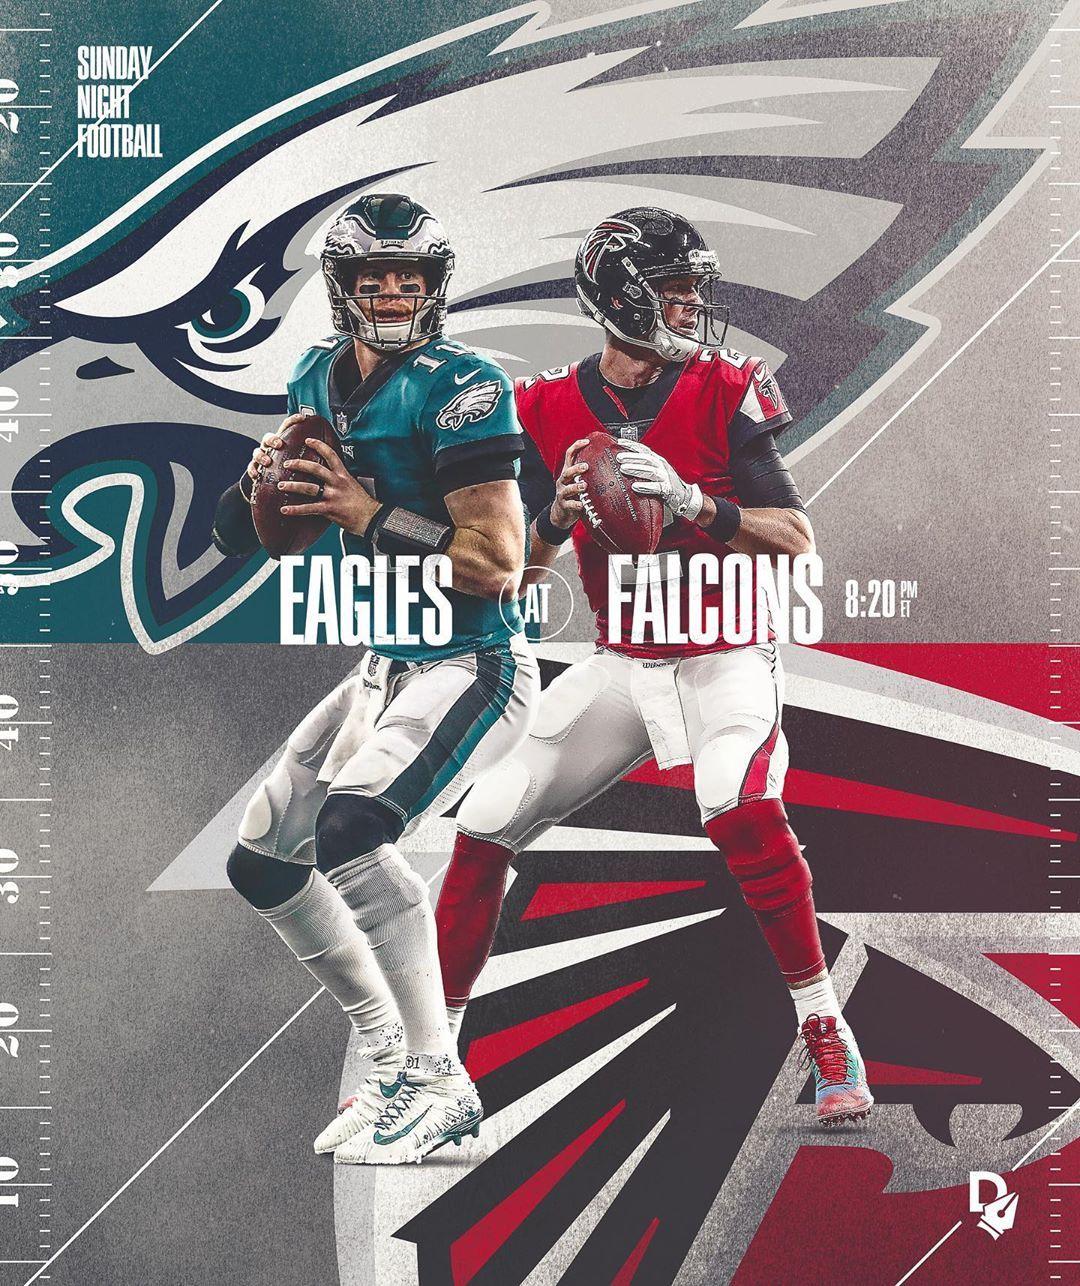 Johnny Silva On Instagram Sunday Night Football Poster Made For Digitalize Nfl N Football Poster Sunday Night Football Sport Poster Design